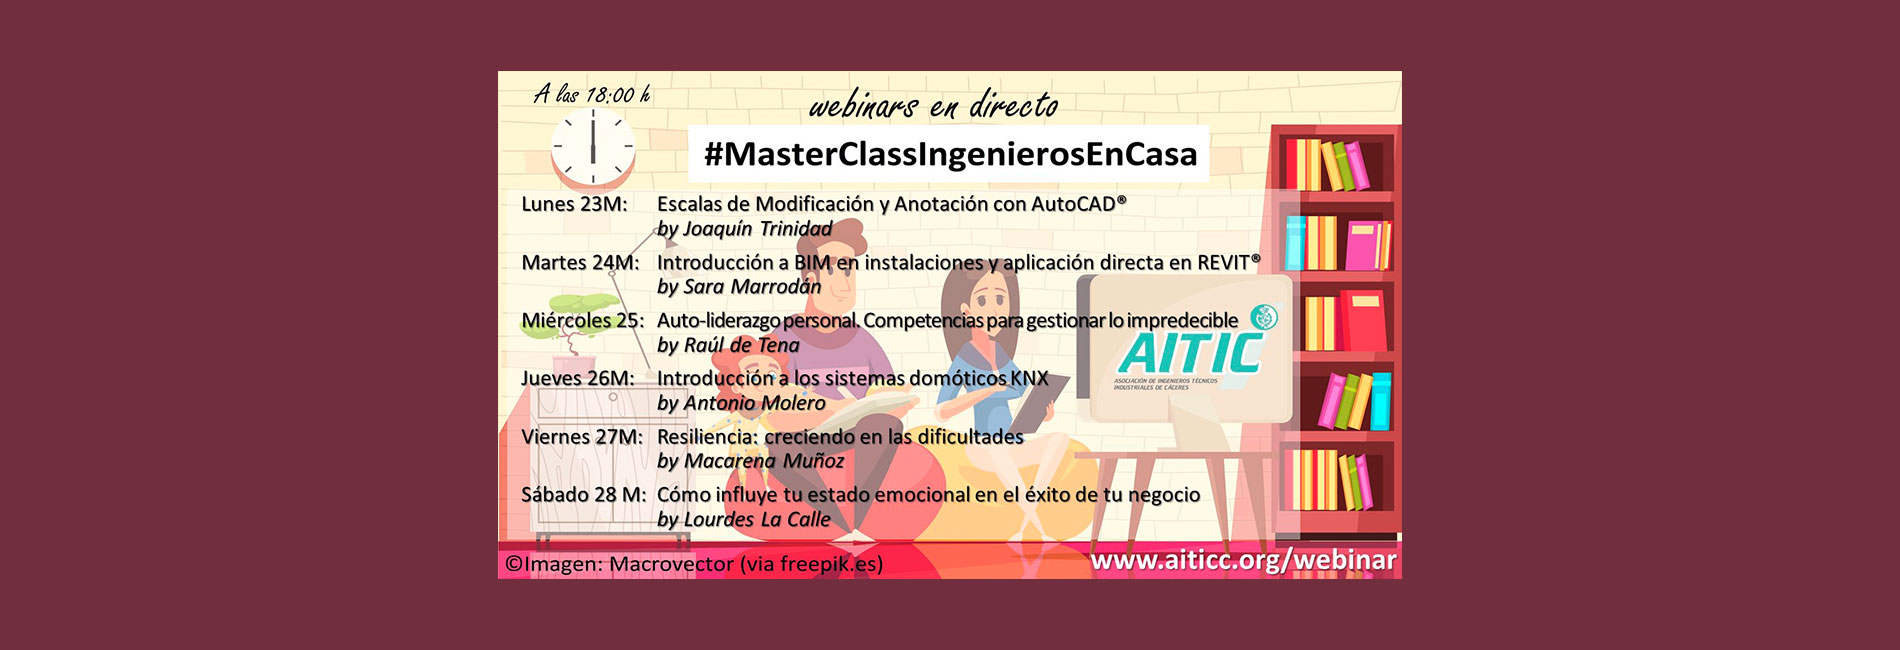 #MasterClassIngenierosEnCasa